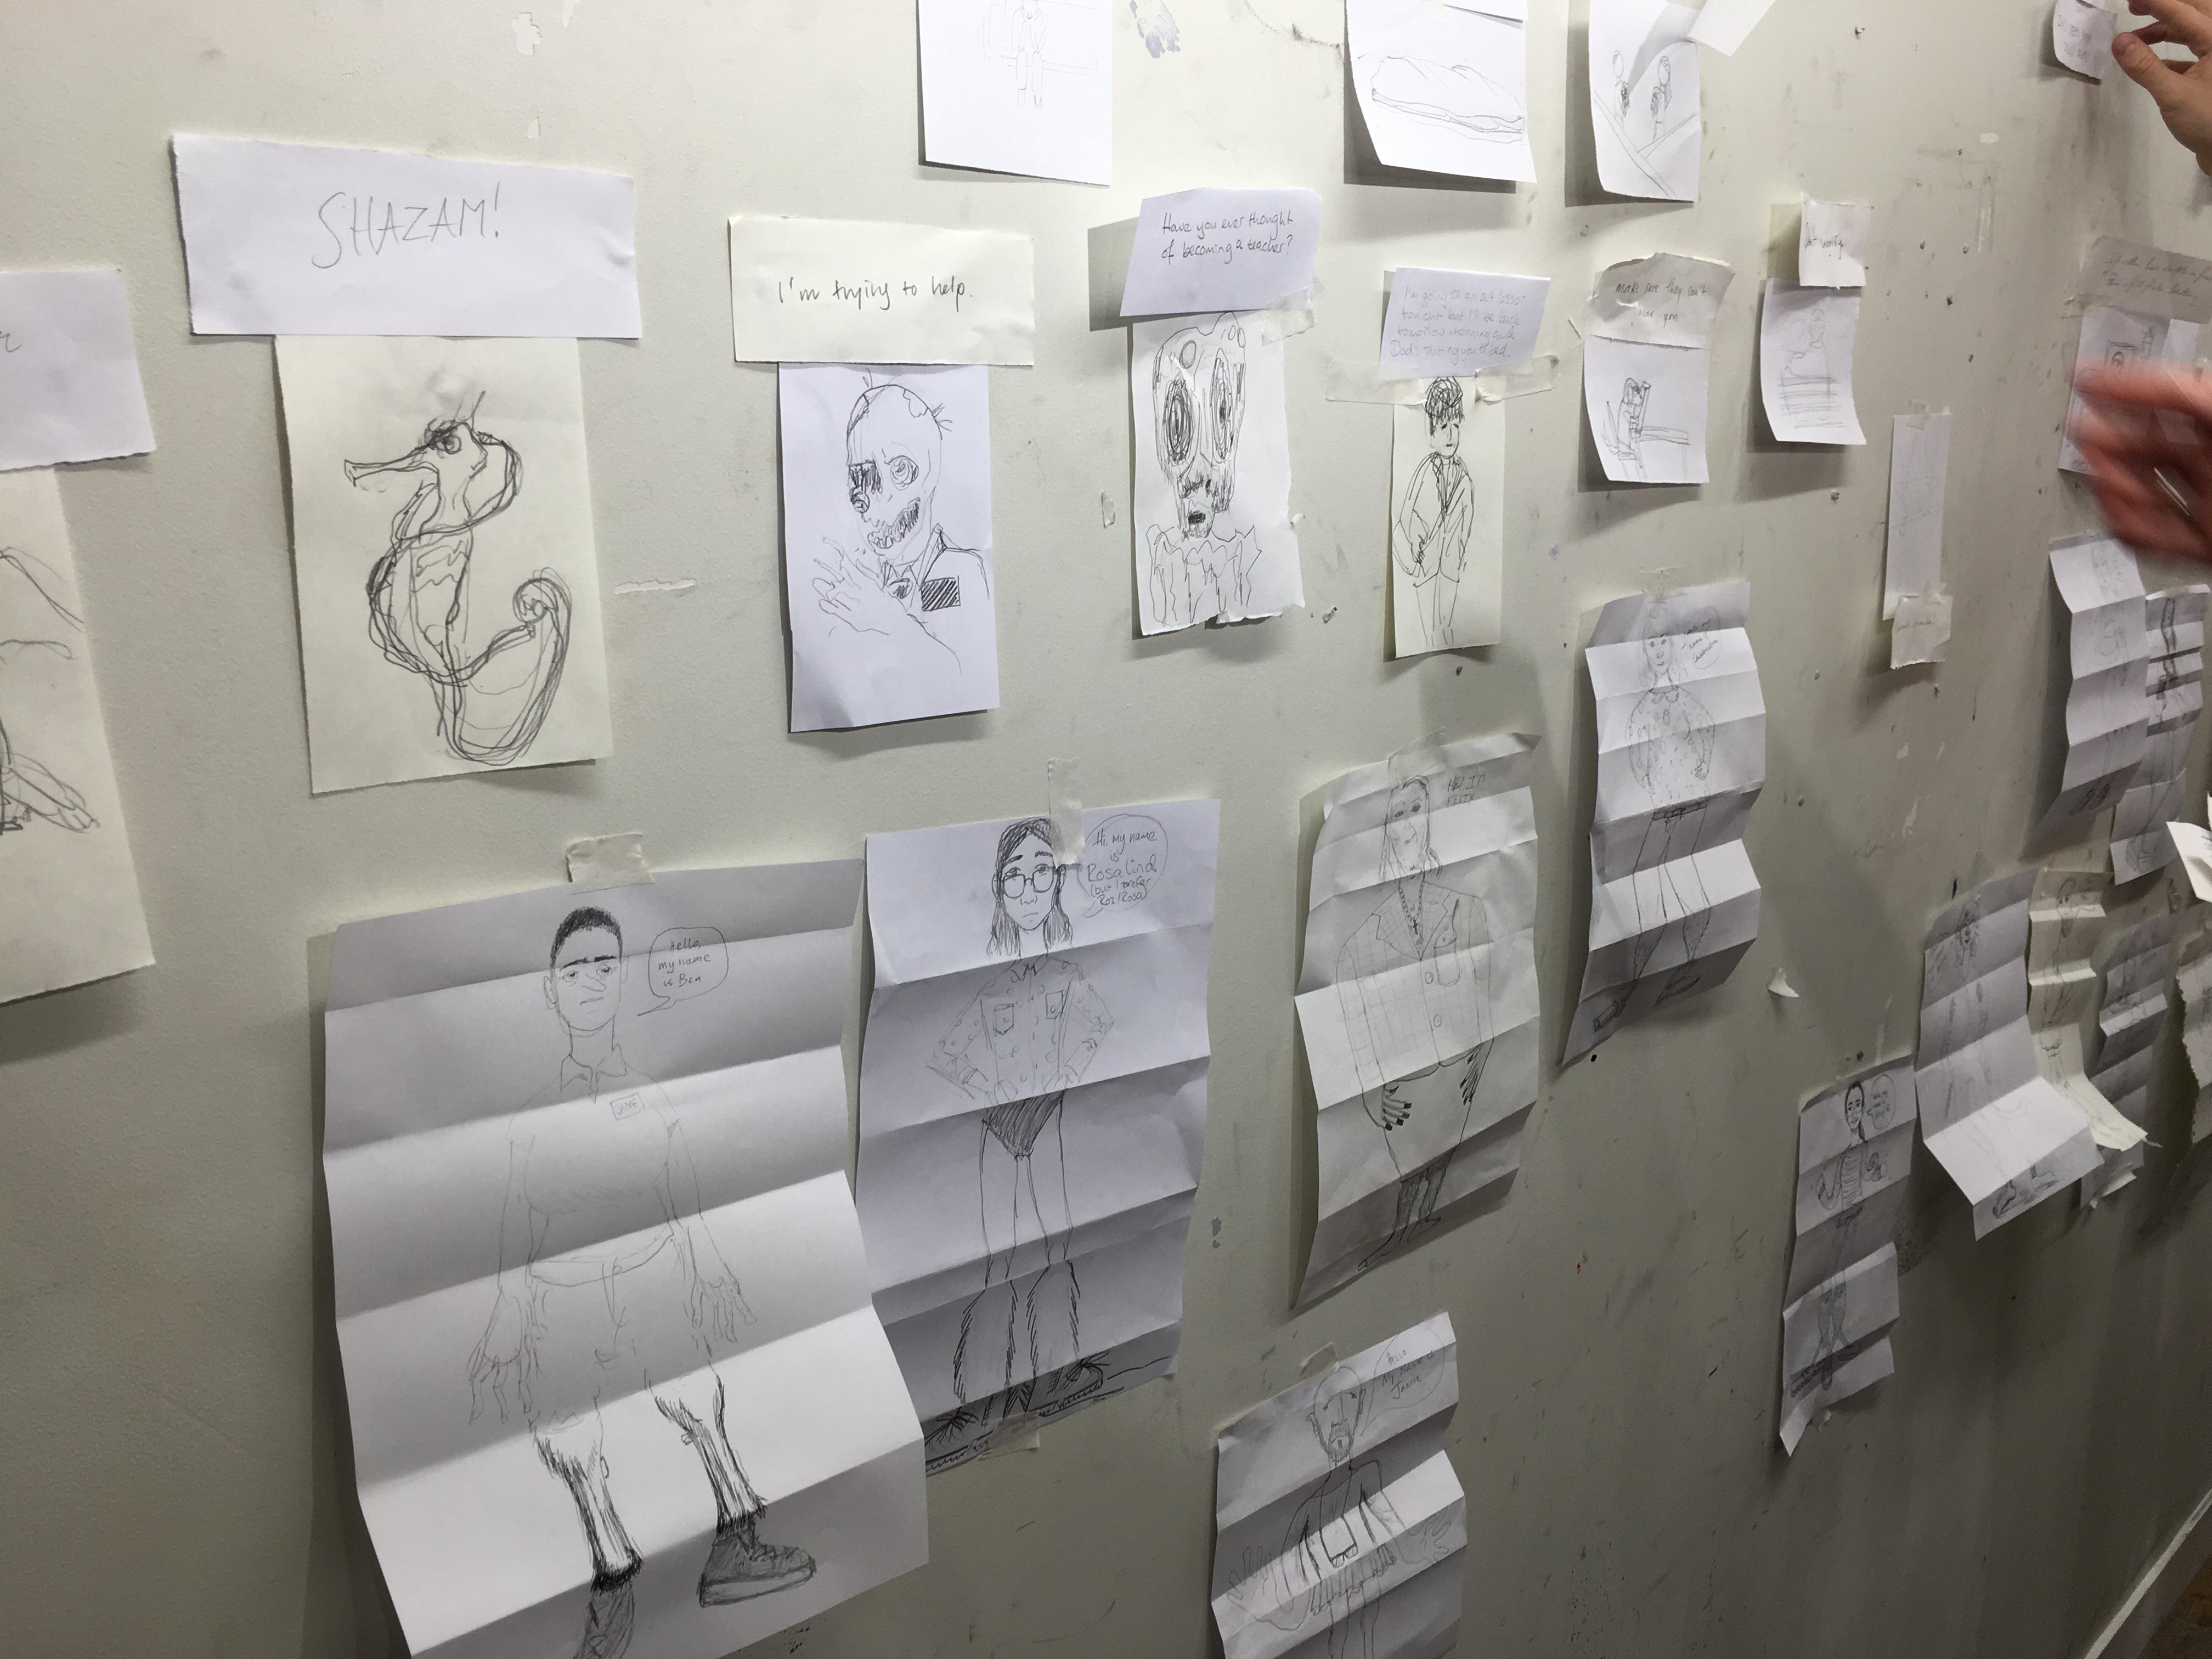 Wall of Posters (Week 1)